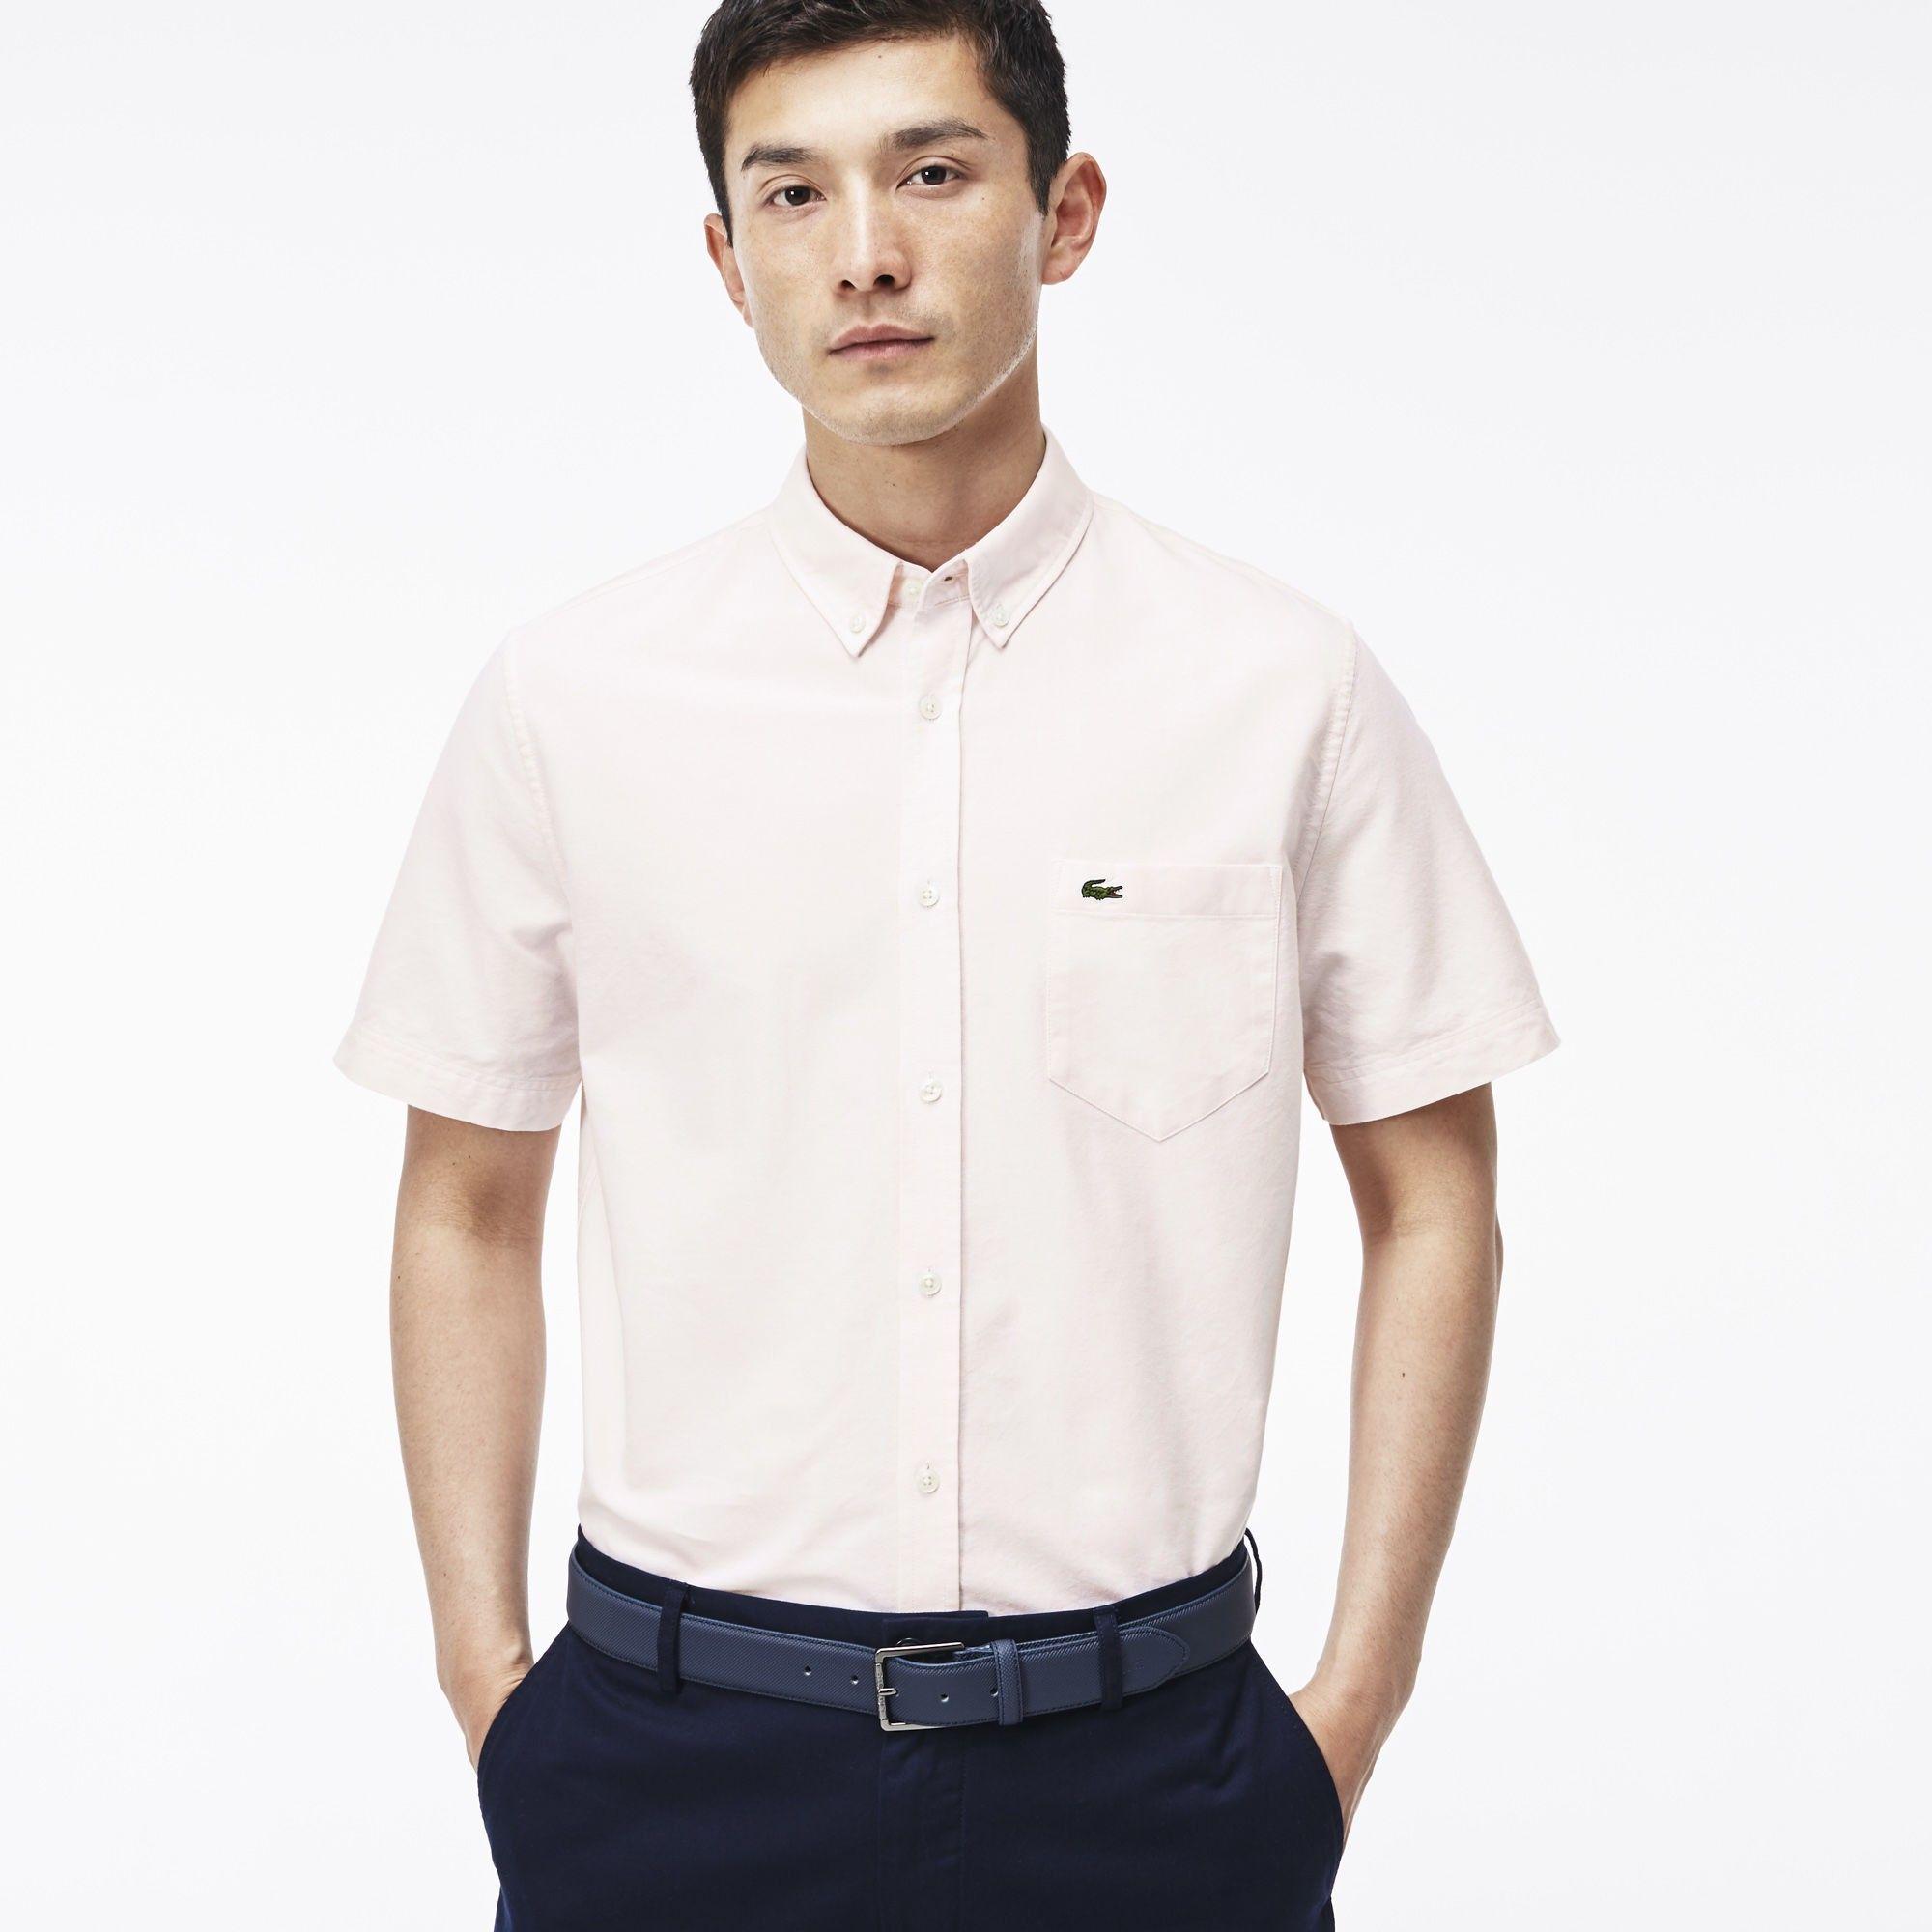 LACOSTE Men'S Oxford Cotton Shirt - Silk Pink/White. #lacoste #cloth #